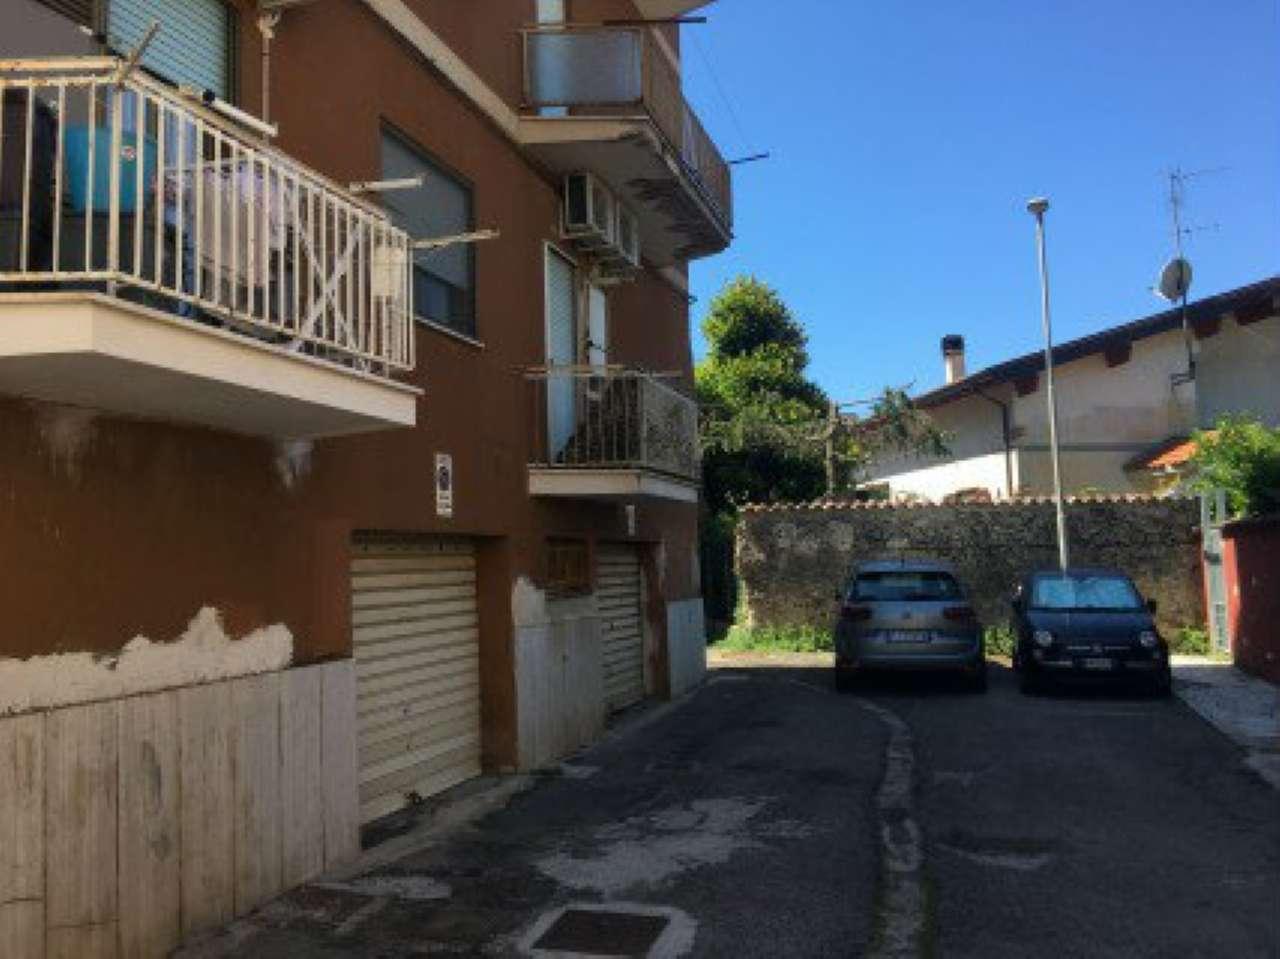 Bilocale, Via Don Morosini, Terracina, foto 16